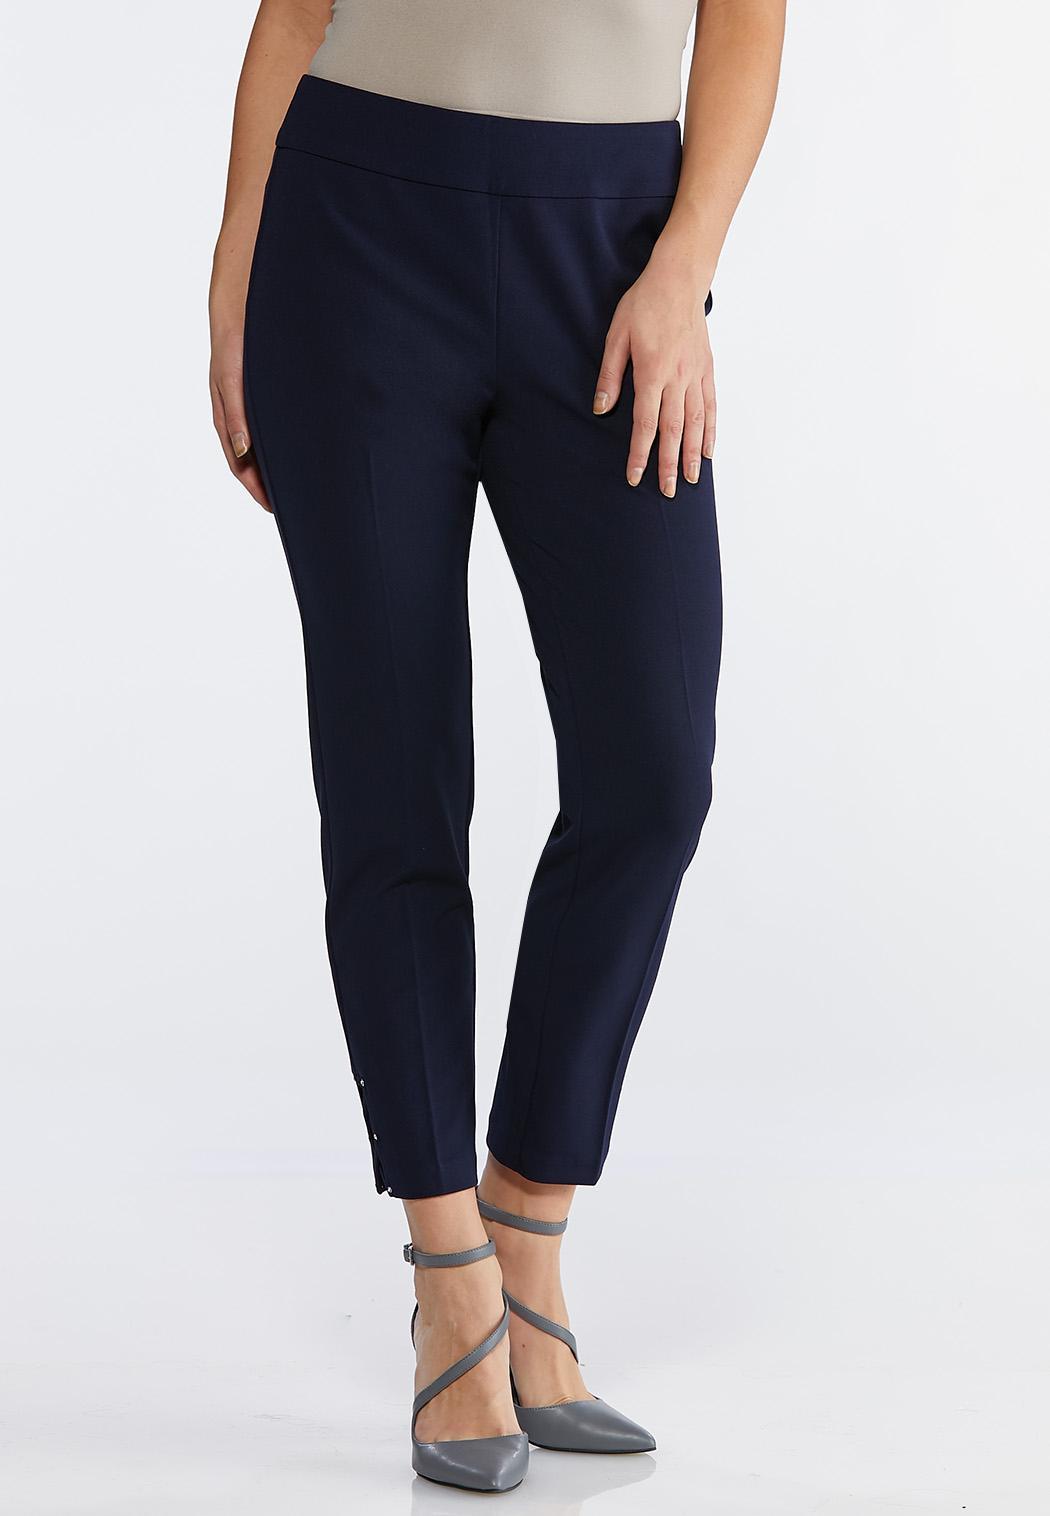 Petite Embellished Ankle Pants